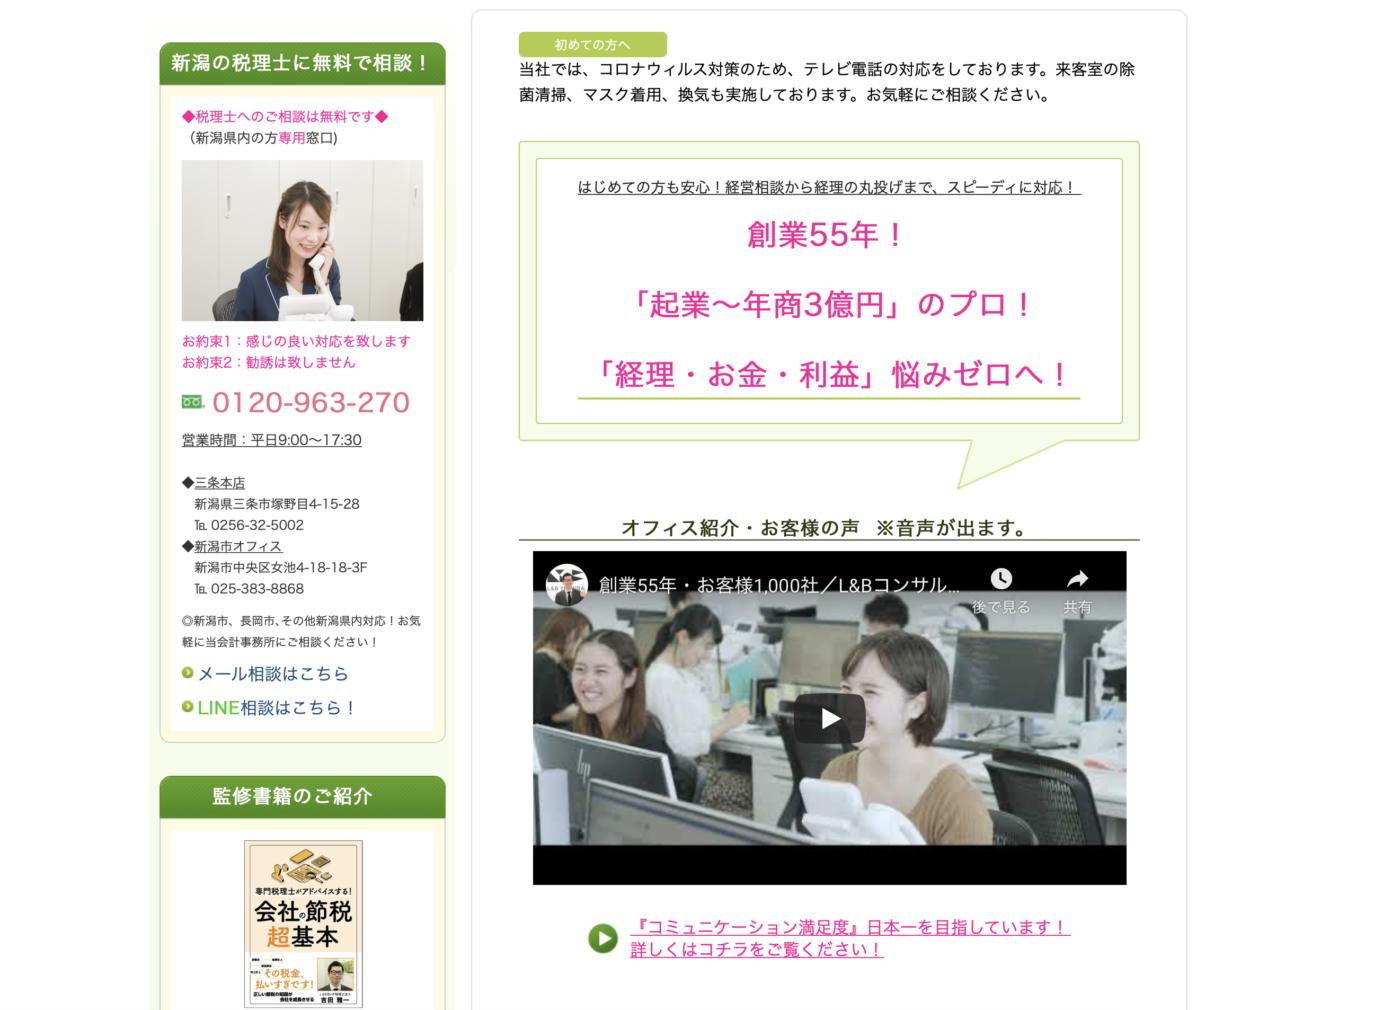 L&Bヨシダ税理士法人 新潟オフィス